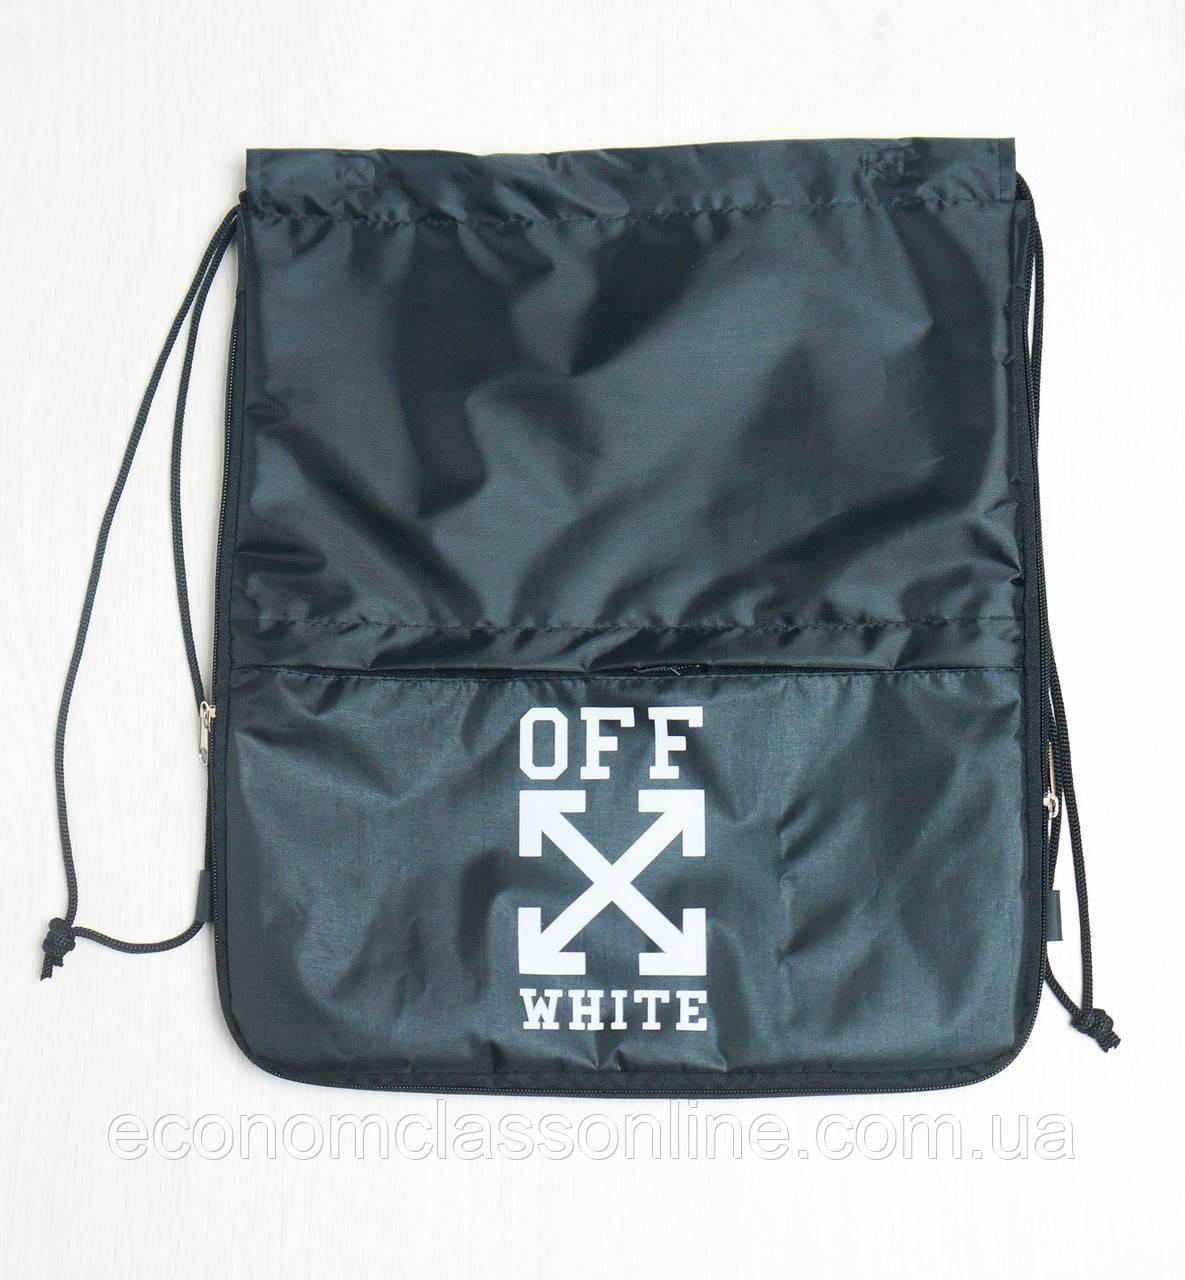 Рюкзак-Мешок для спорта Off White